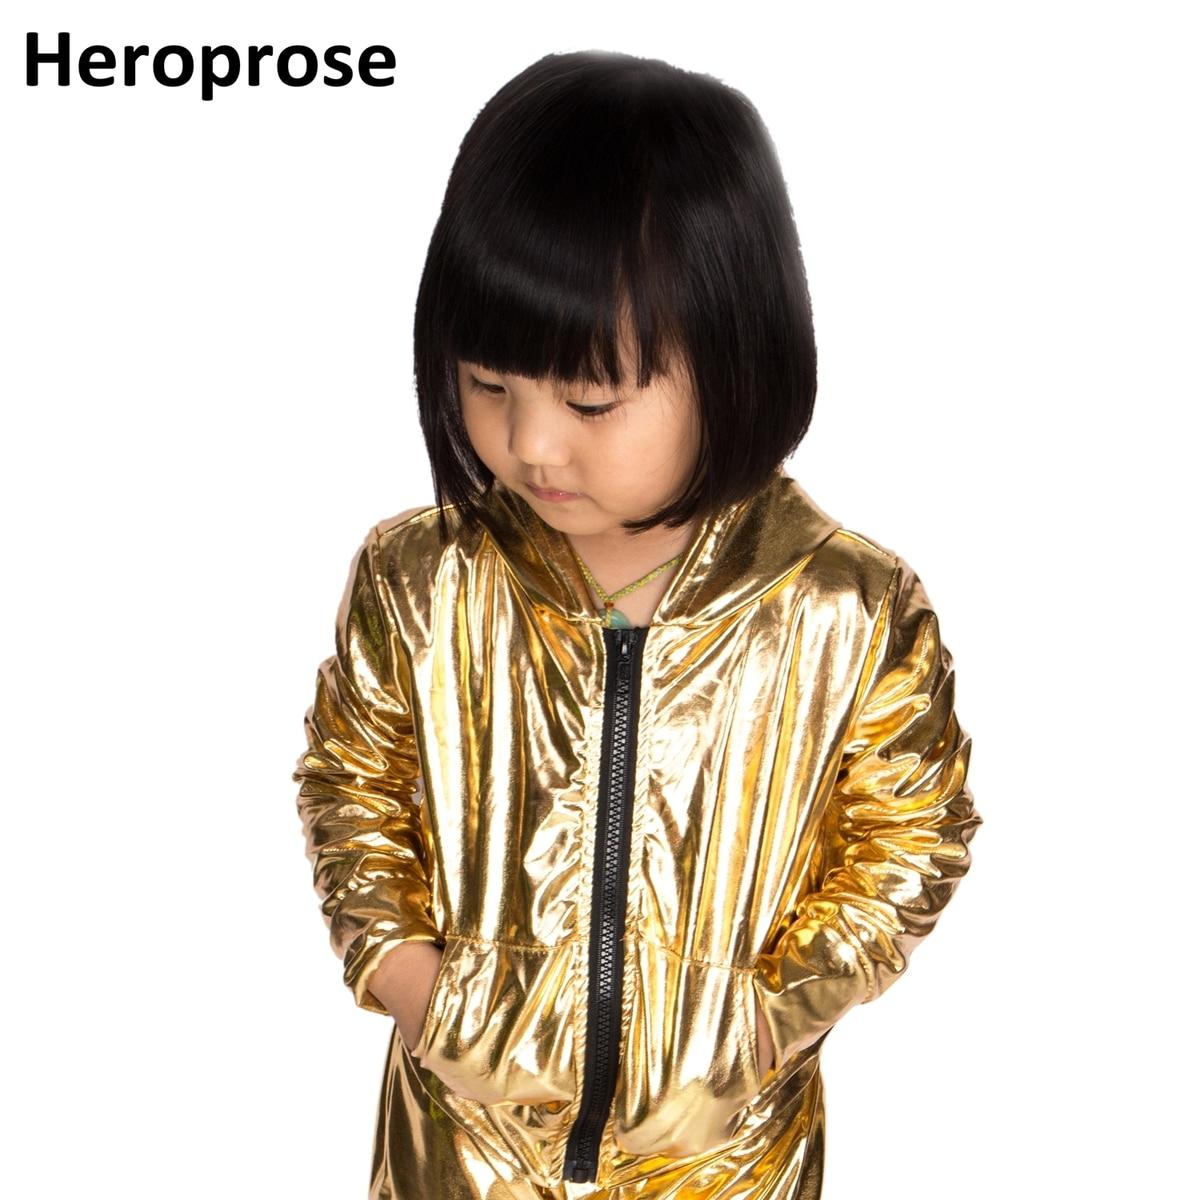 Spring Autumn Kids Gold bomber Jacket Stage Performance Wear paillette feminina casaco Hip Hop dance coat striped trim fluffy panel bomber jacket